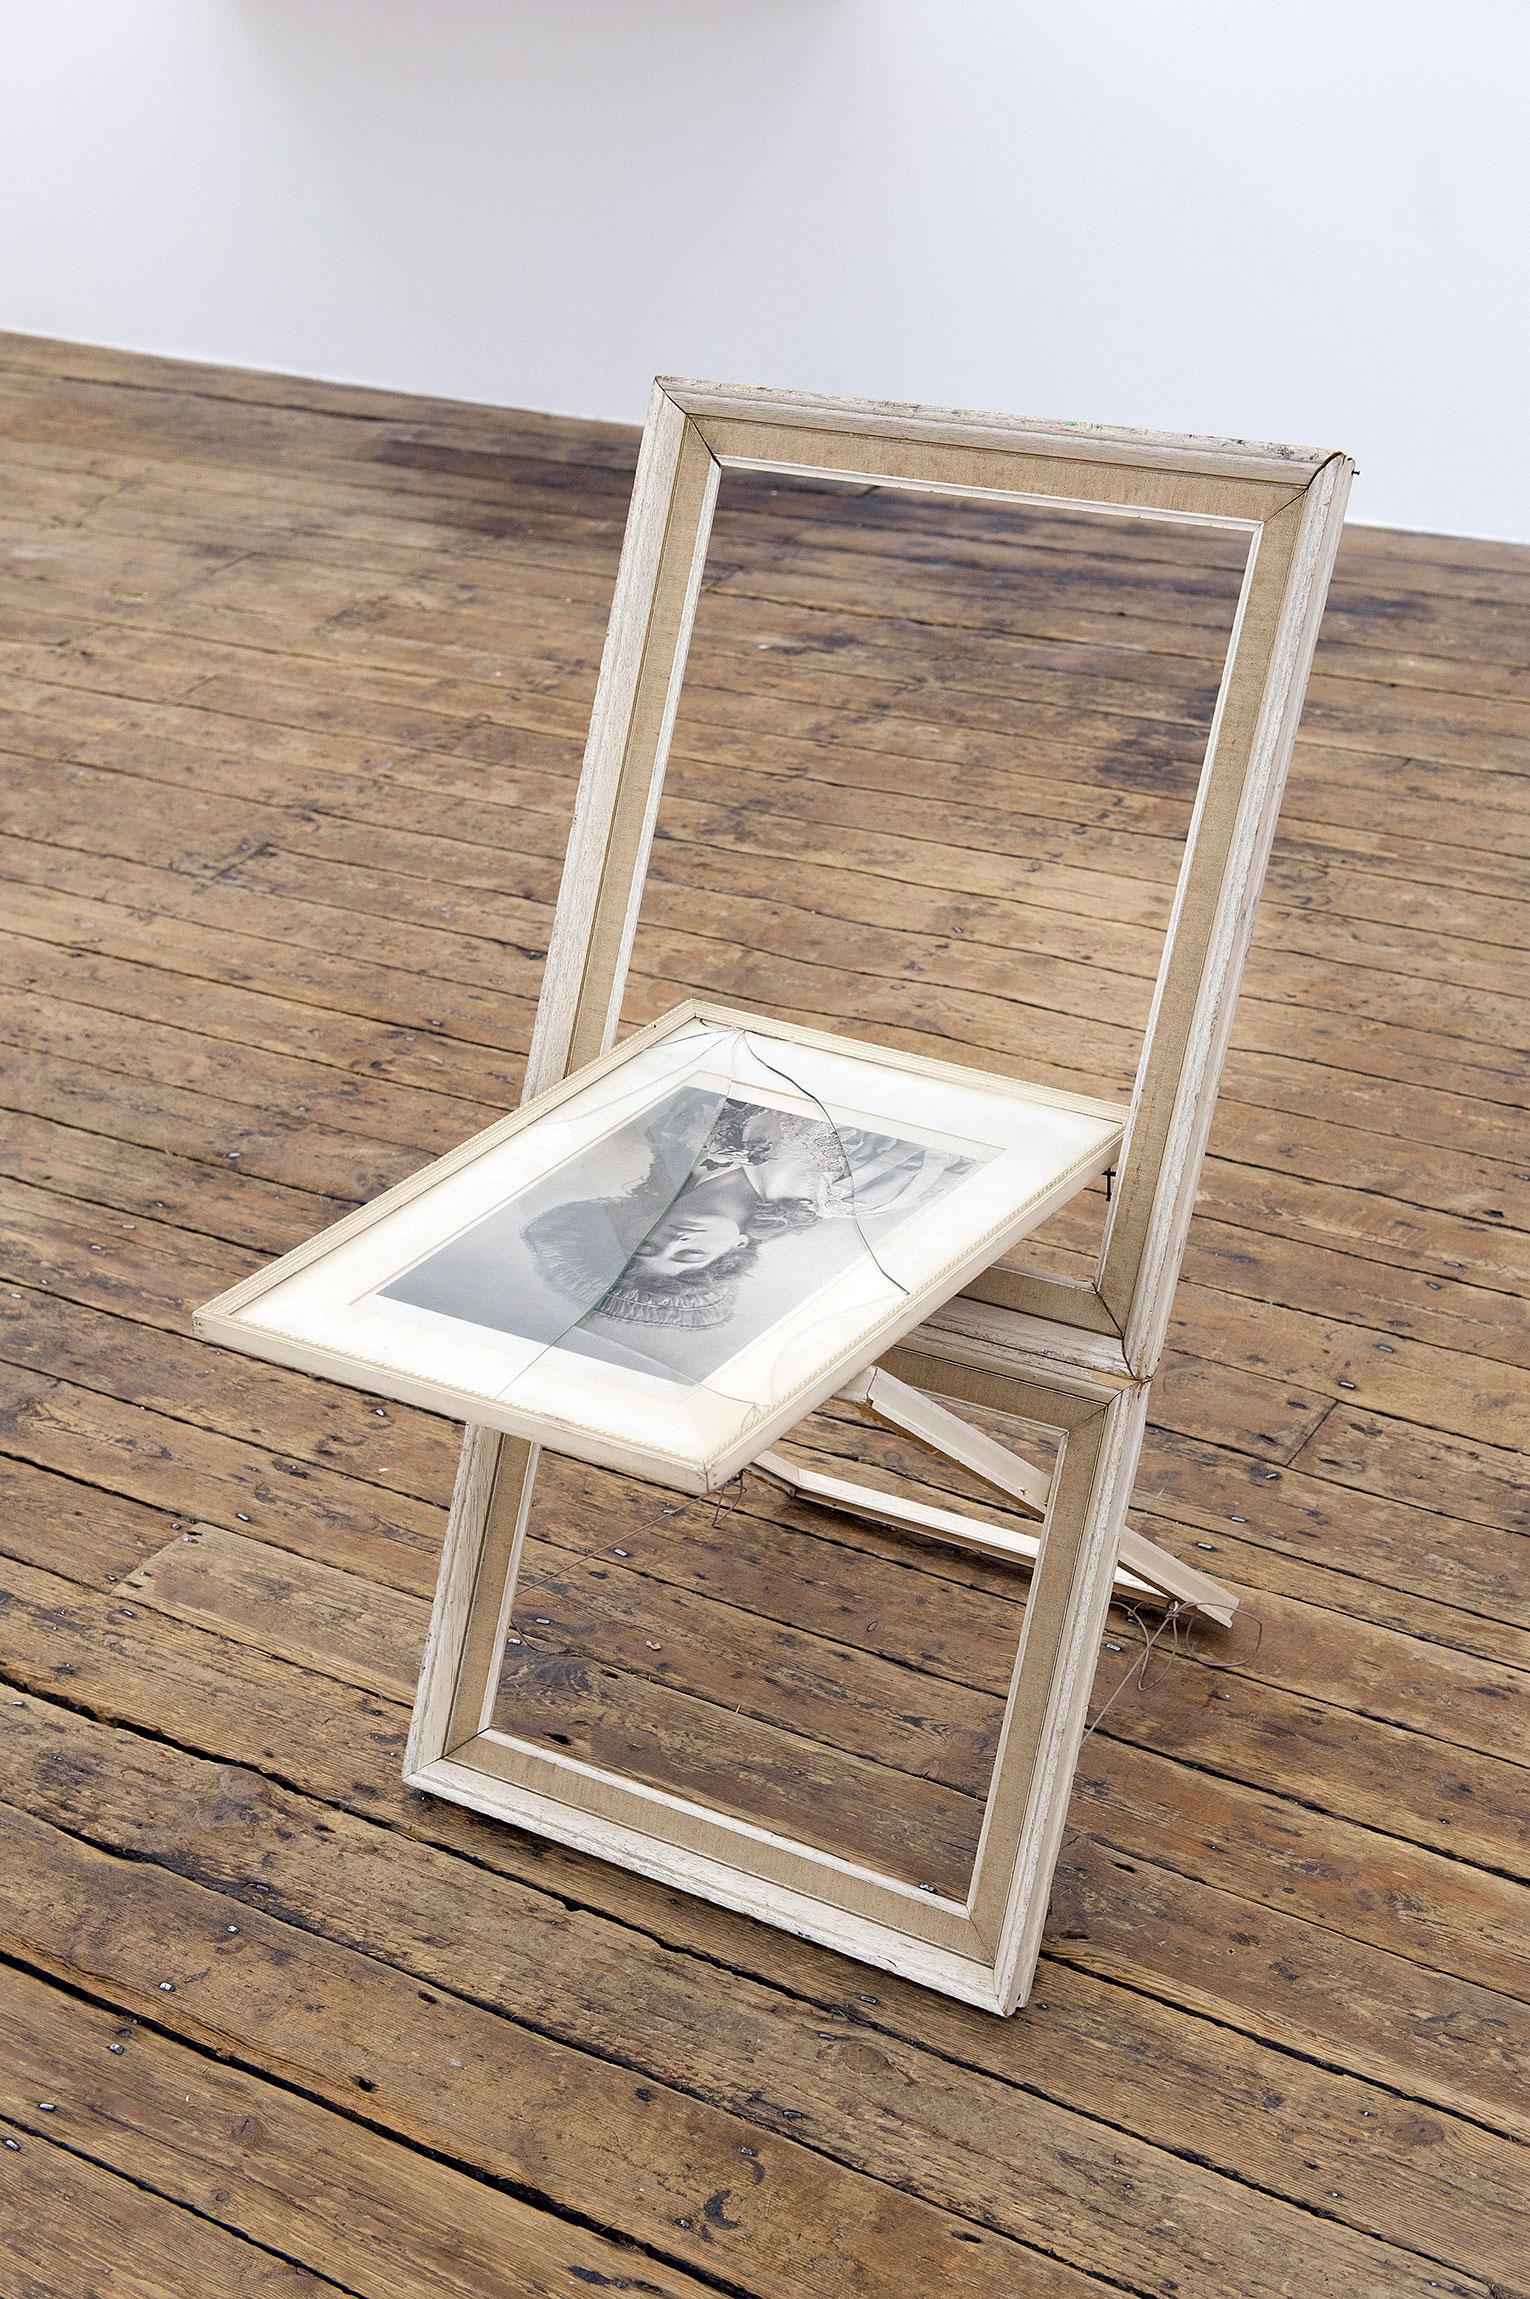 <b>Title:</b>Maverick XV<br /><b>Year:</b>2011<br /><b>Medium:</b>Antique and found picture frames<br /><b>Size:</b>82 x 47 x 44 cm